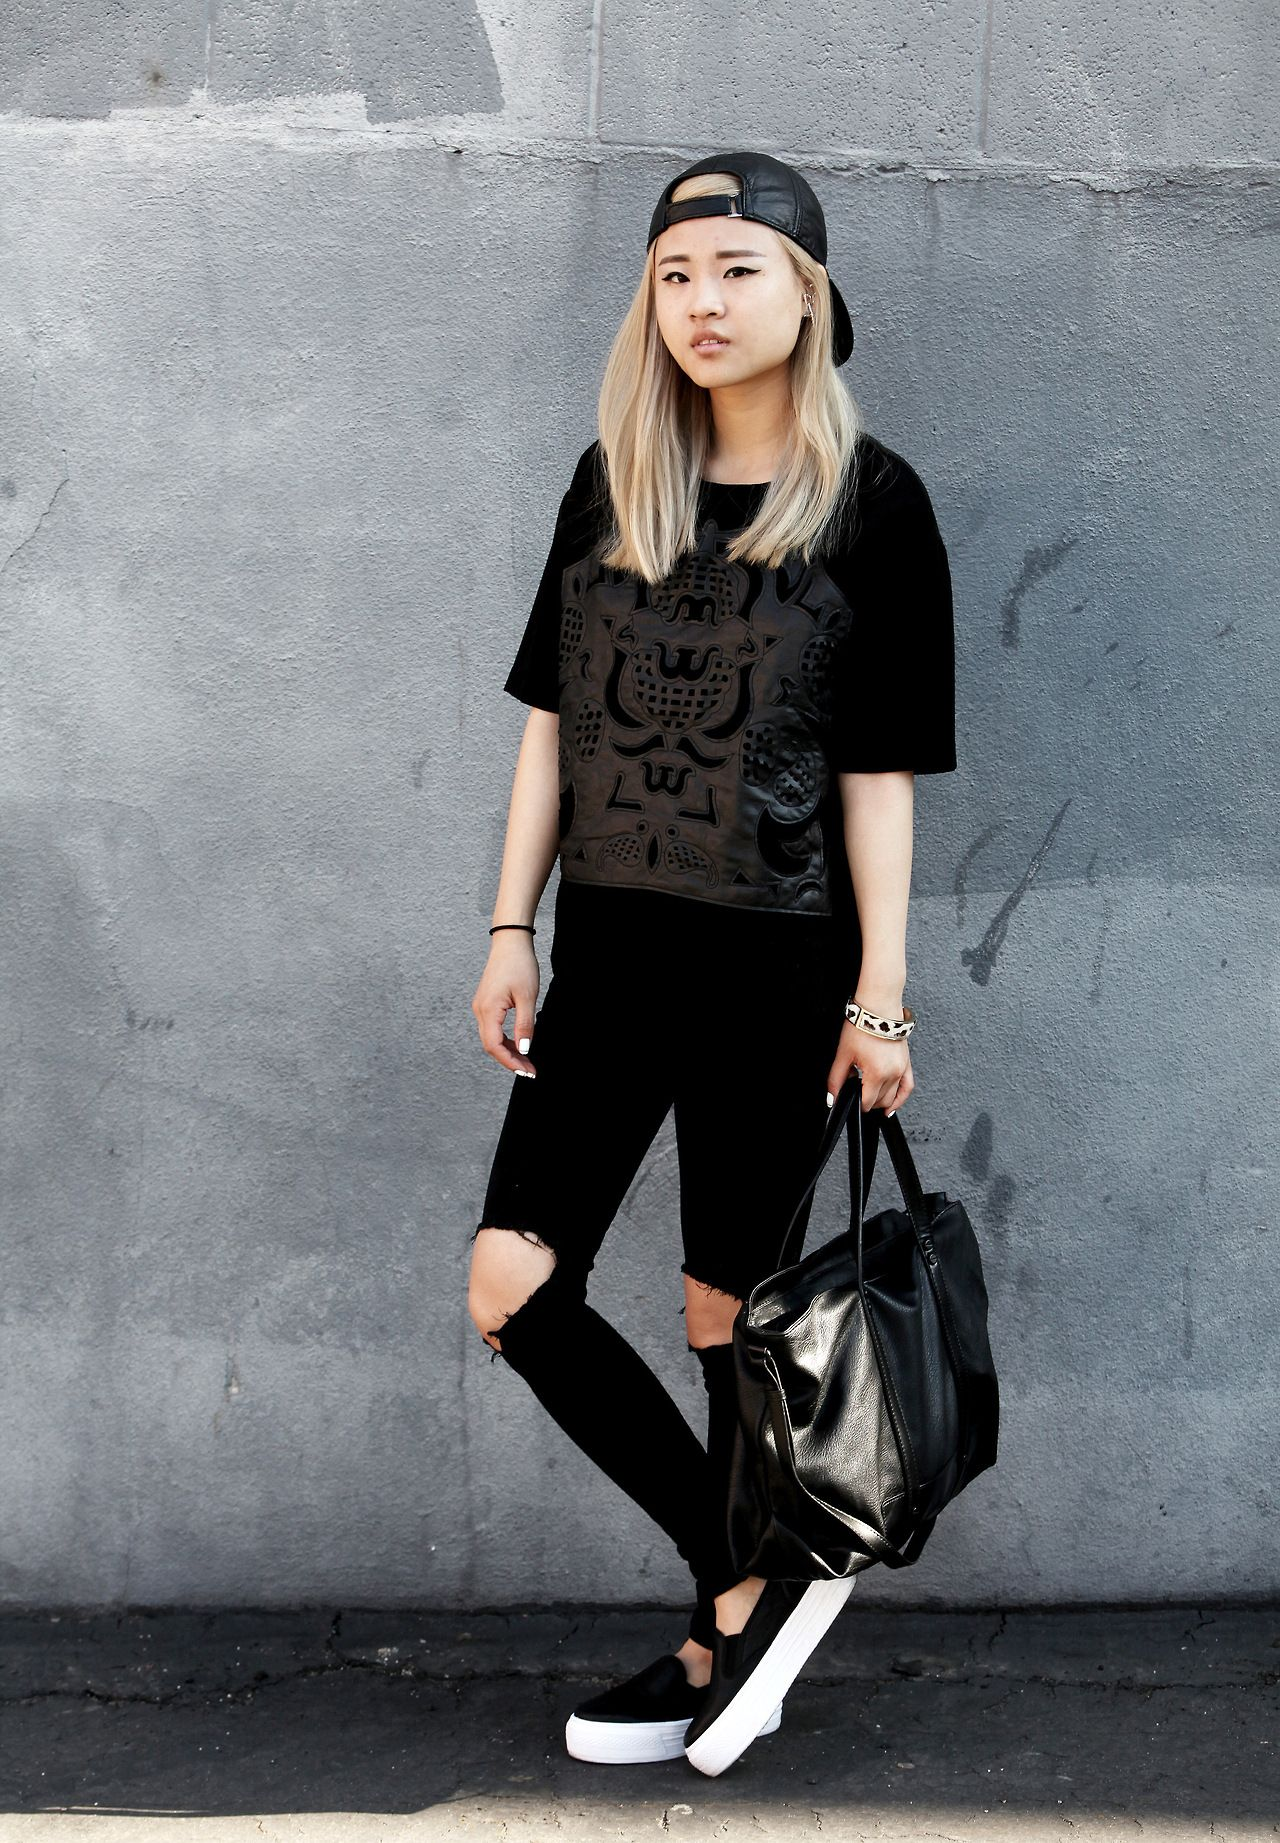 Fashion Teen trends foto tumblr photo